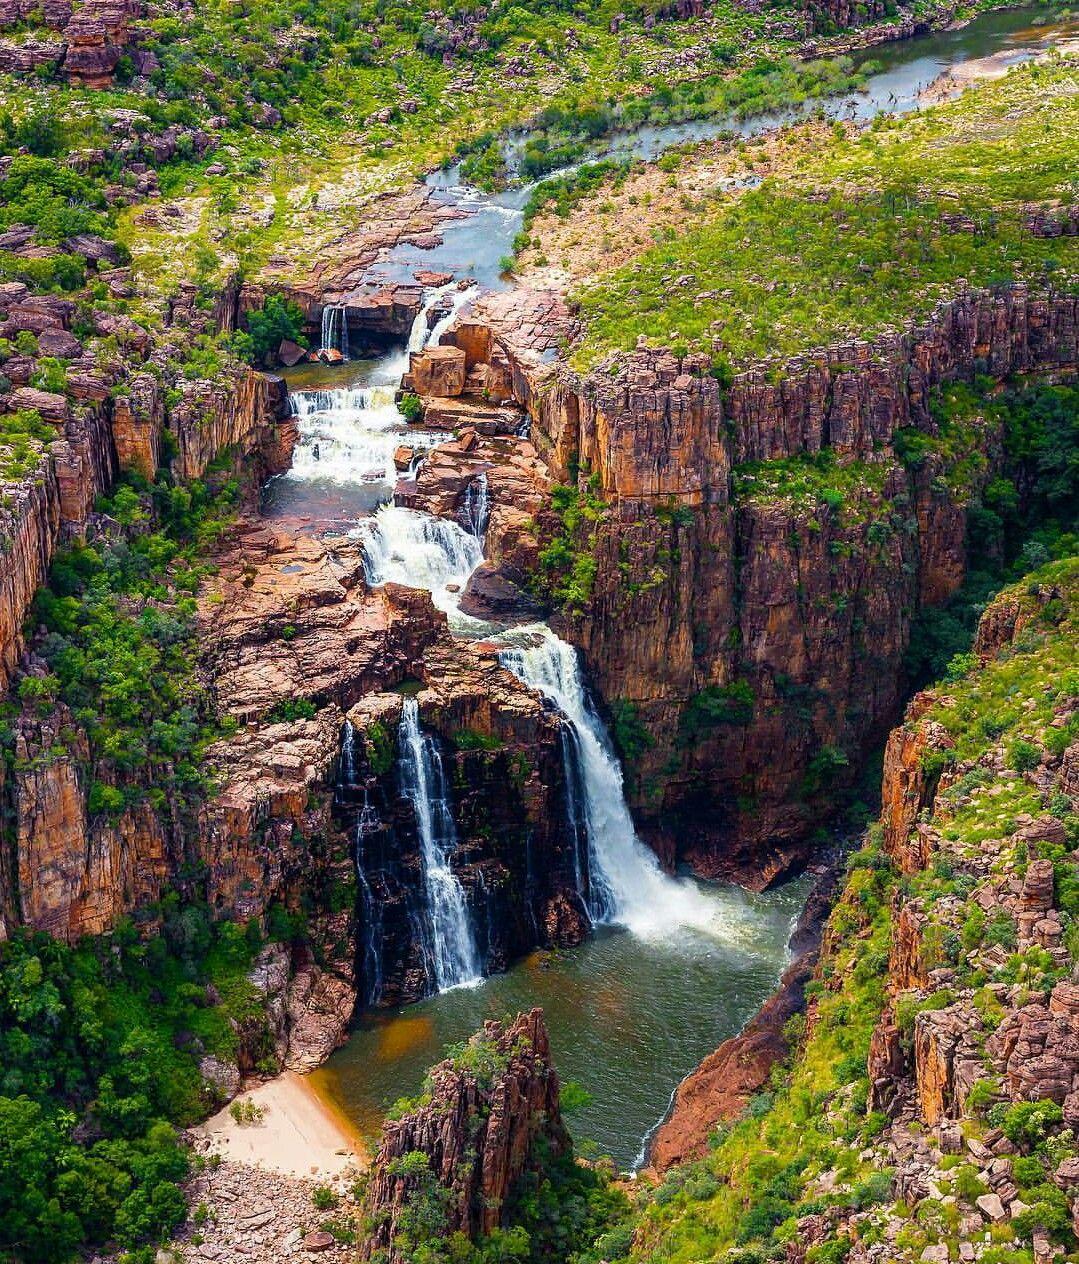 Twin Falls, Kakadu National Park, Australia. This